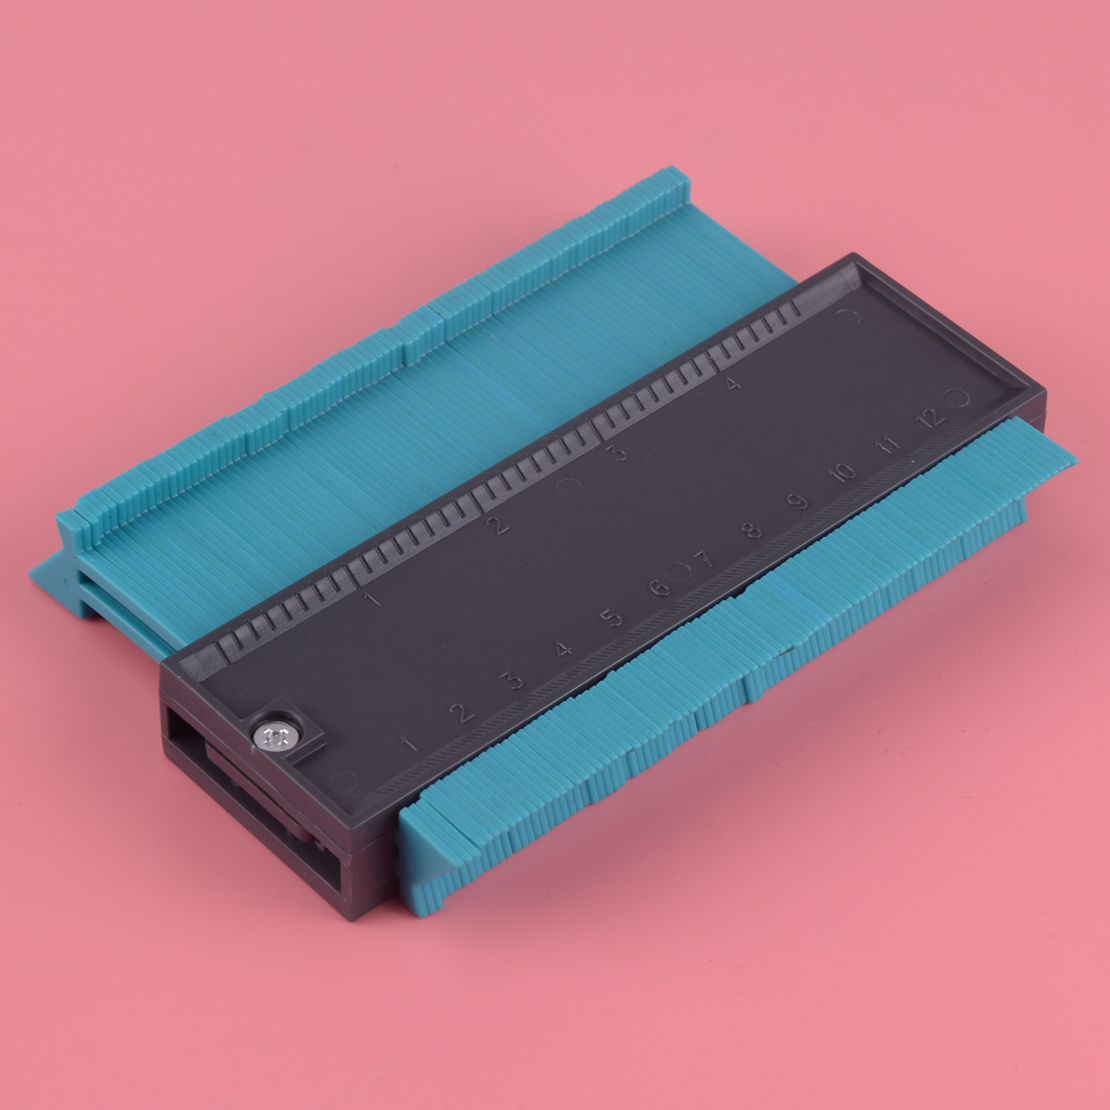 LETAOSK 5 Inch Measure Ruler Contour Profile Gauge Tiling Laminate Edge Shaping Craft Tool Instant Template